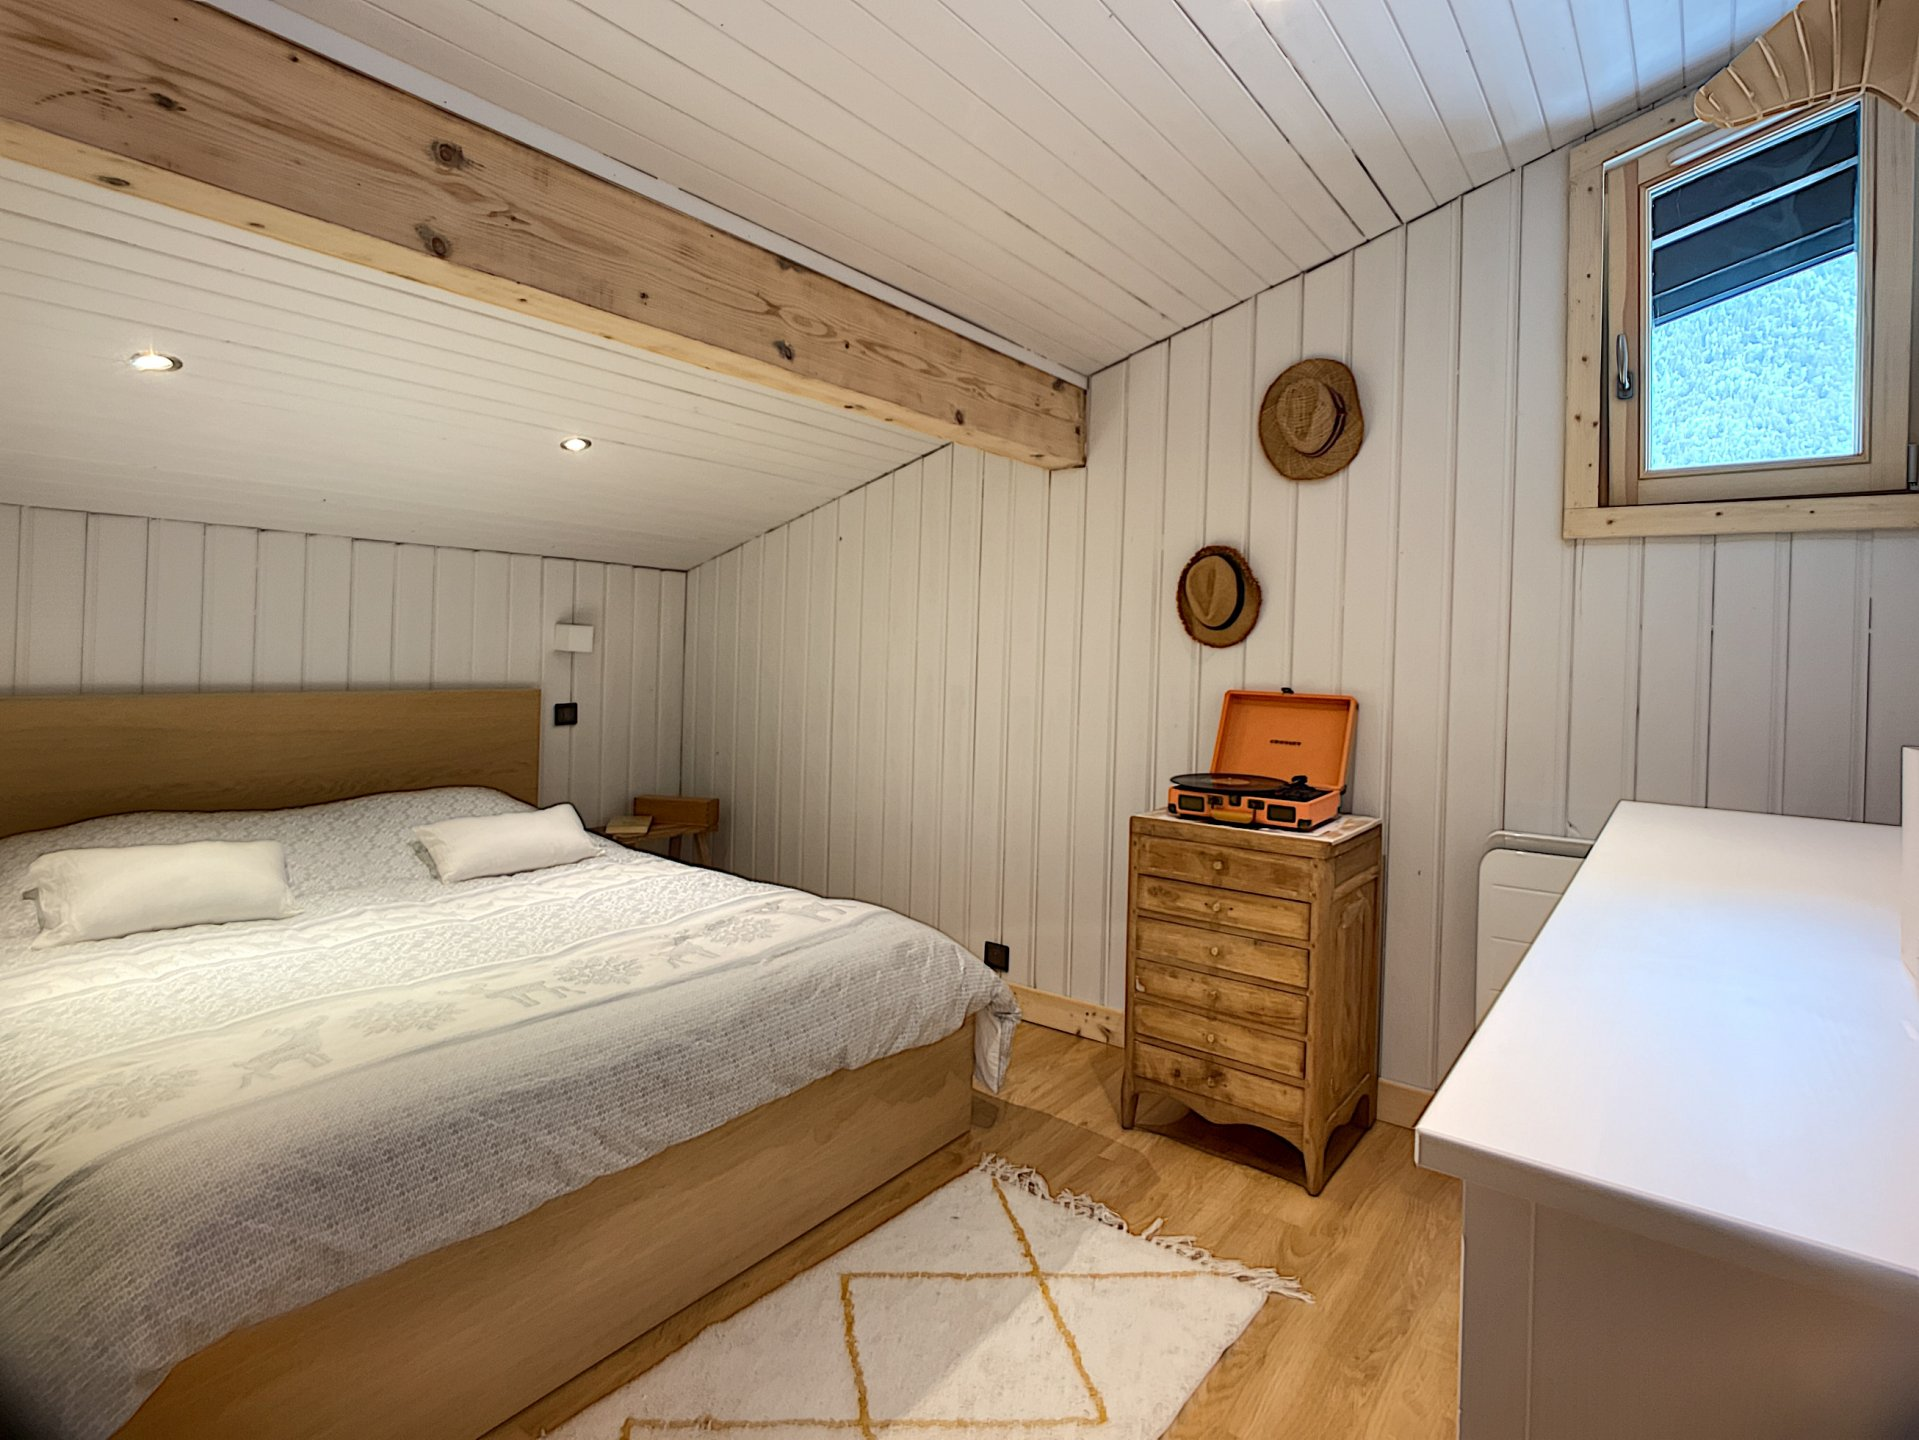 2 bedroom apartment Chamonix Mont-Blanc garden